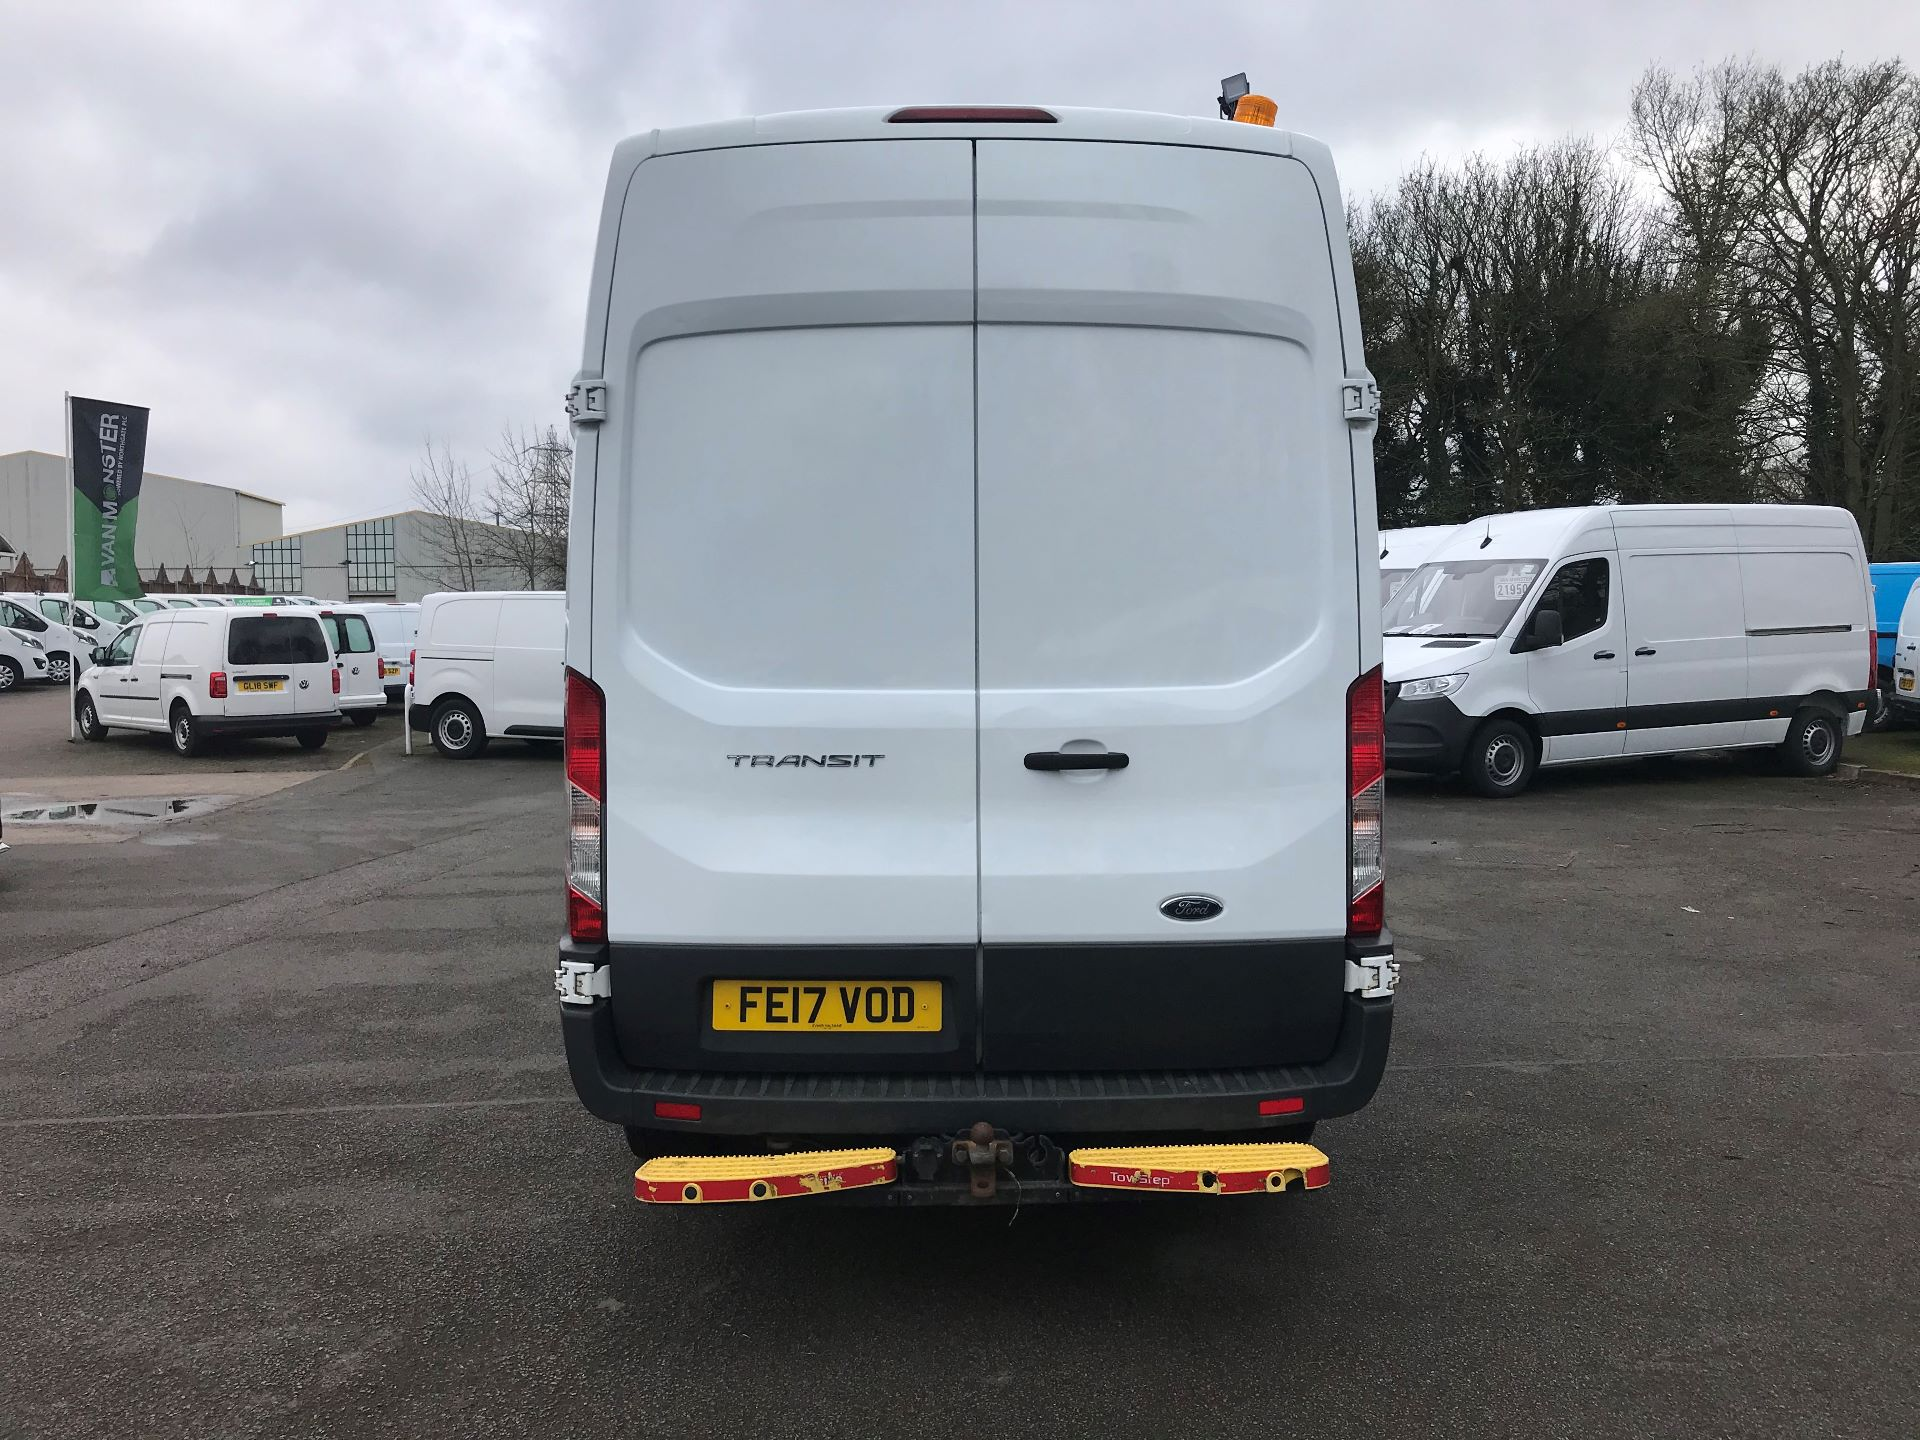 2017 Ford Transit L3 H3 VAN 130PS EURO 6 (FE17VOD) Image 7